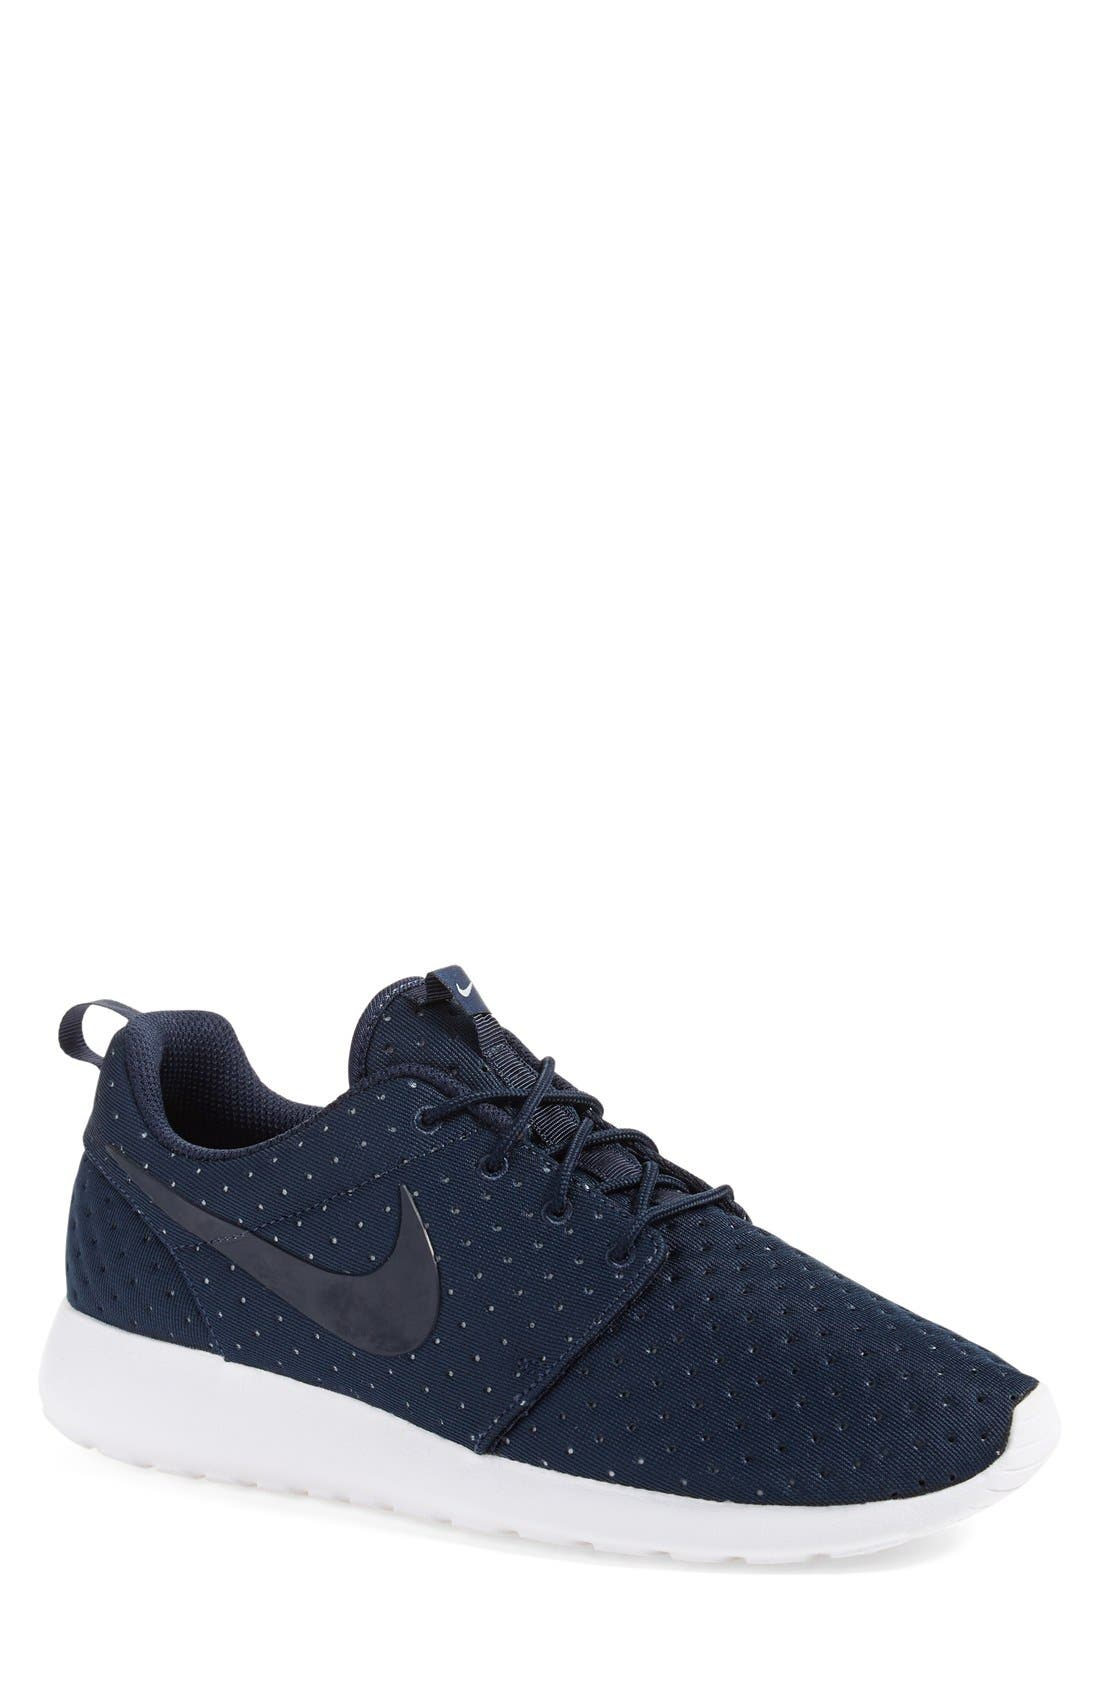 'Roshe One SE' Sneaker,                             Main thumbnail 1, color,                             Obsidian/ Obsidian/ Grey